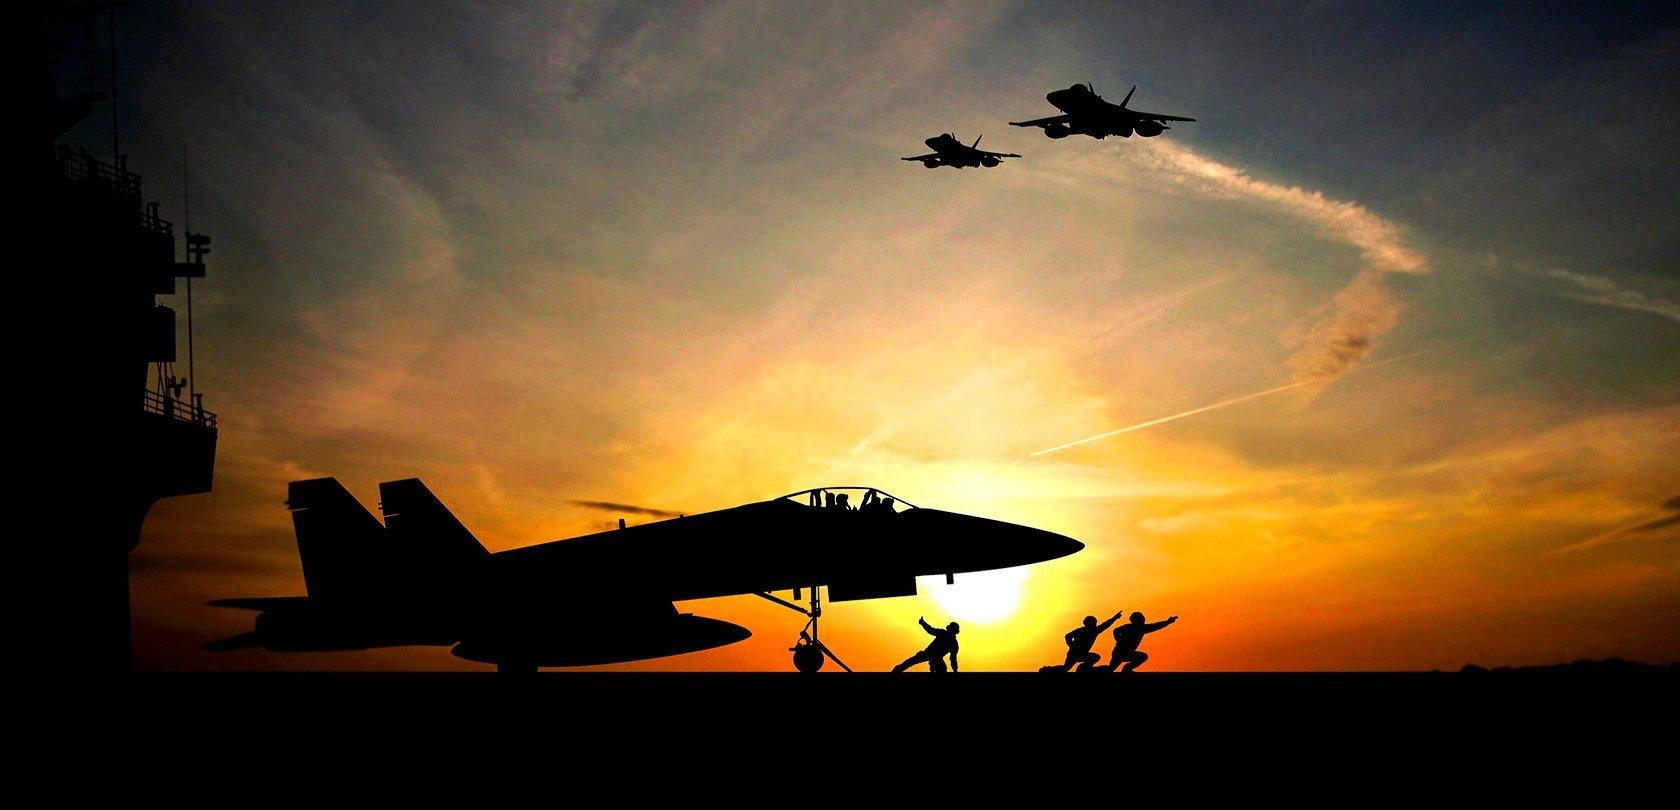 fa-18-super-hornet-sunset-1680x810